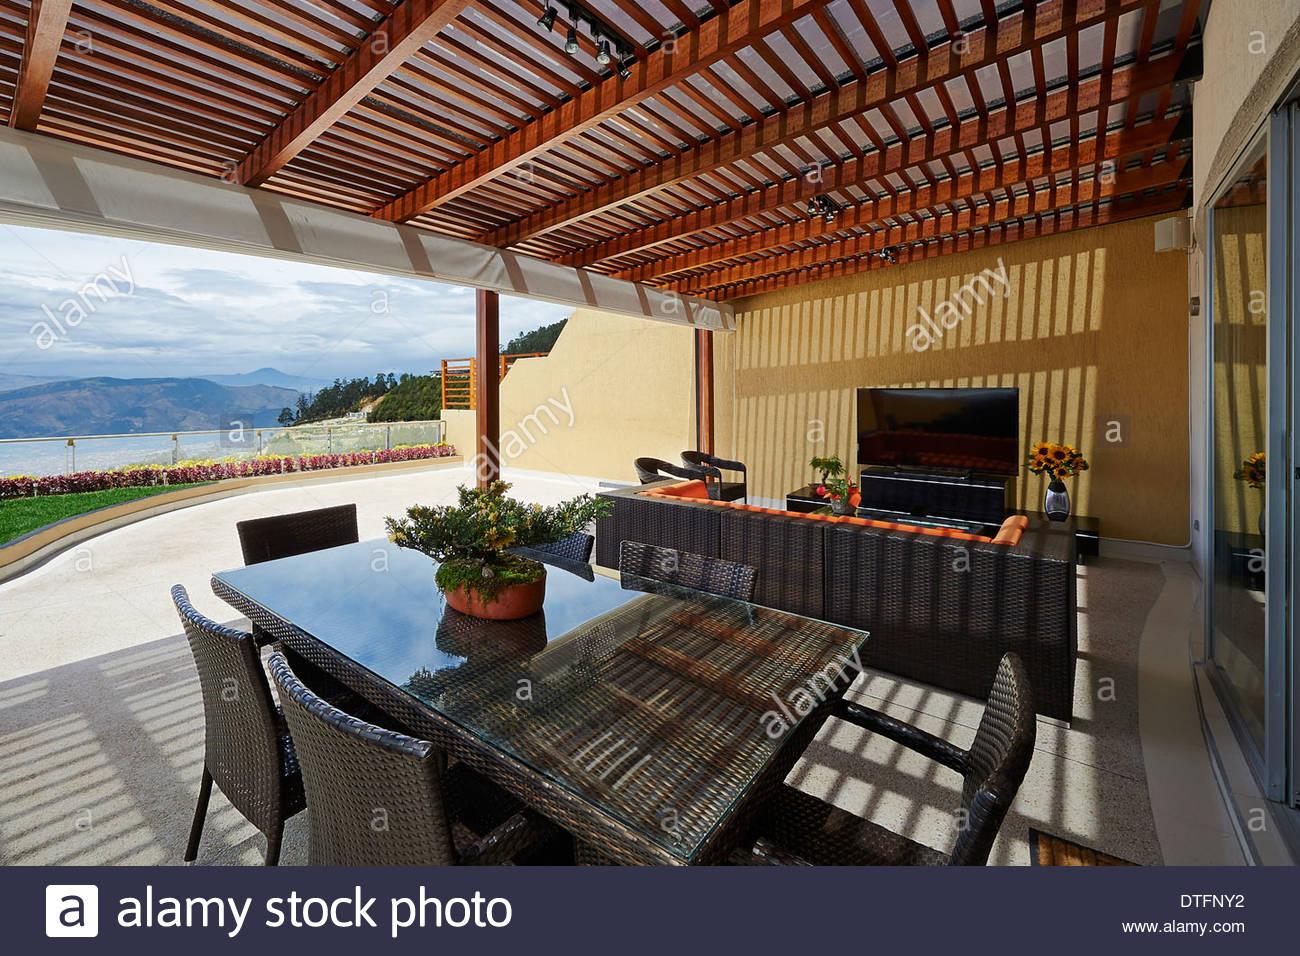 Full Size of Pergola Modern Interior Design Beautiful Terrace Lounge With Küche Weiss Deckenlampen Wohnzimmer Modernes Bett 180x200 Tapete Sofa Moderne Deckenleuchte Wohnzimmer Pergola Modern